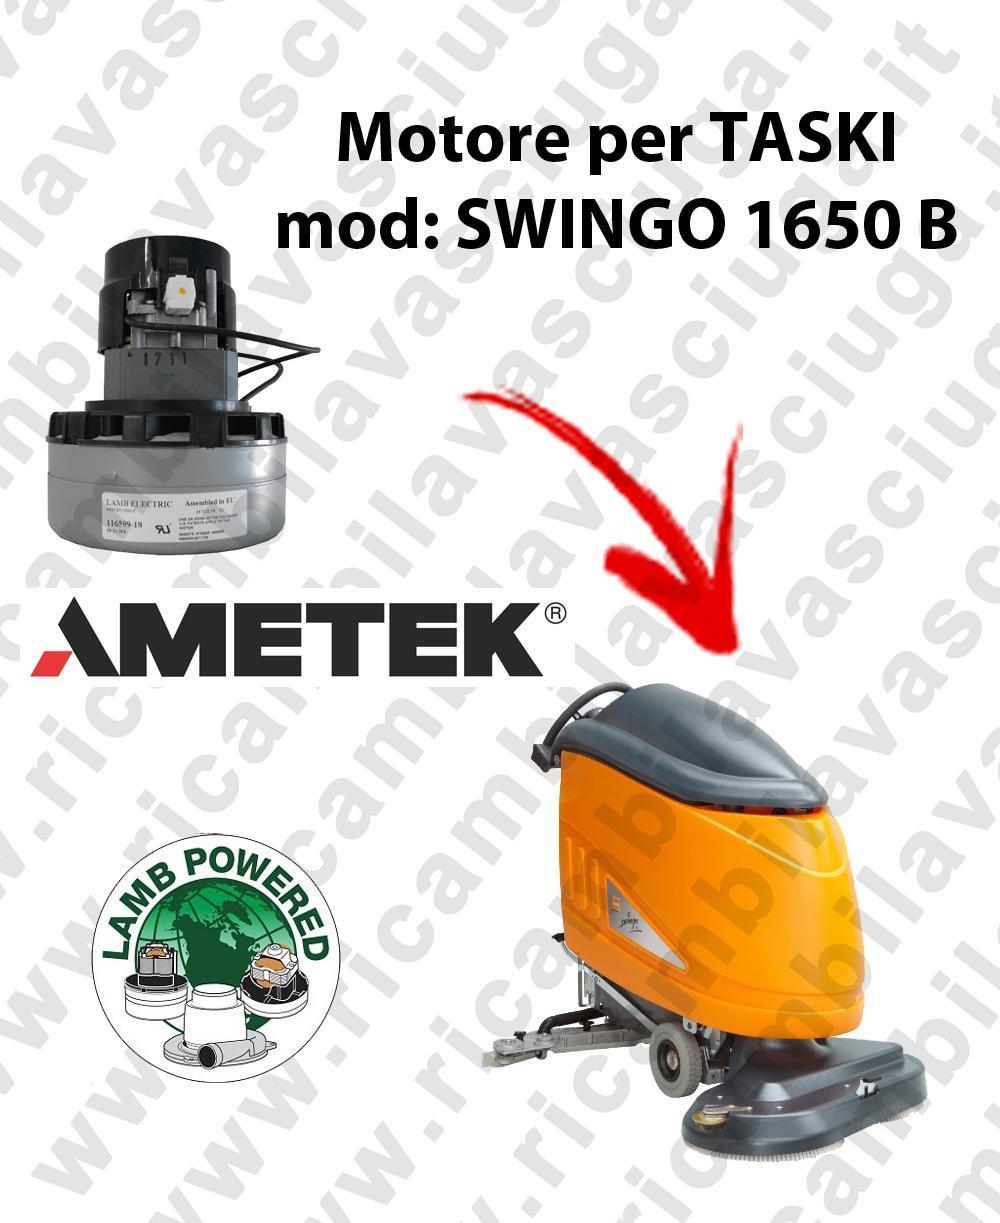 SWINGO 1650 B Motore de aspiración LAMB AMETEK para fregadora TASKI